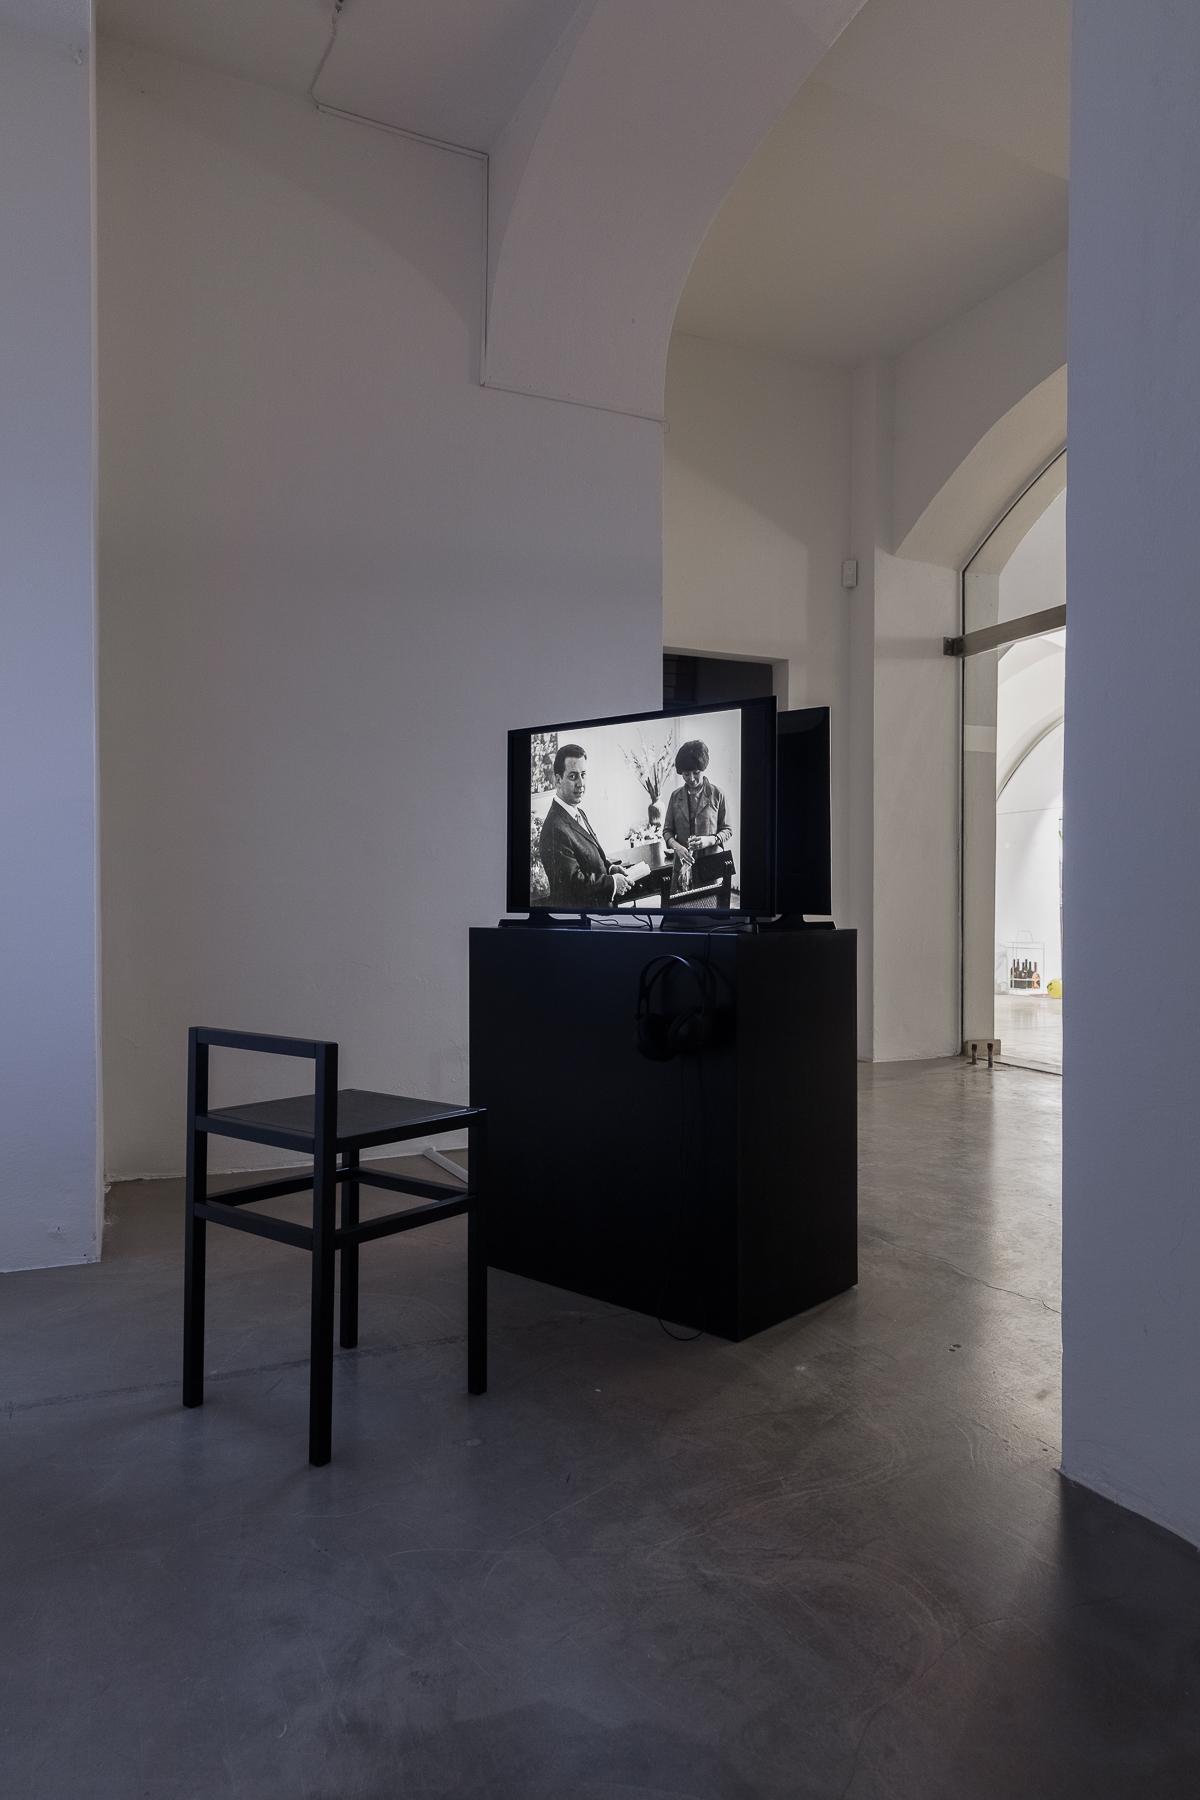 2019_03_11_Grazer Kunstverein_064_web.jpg